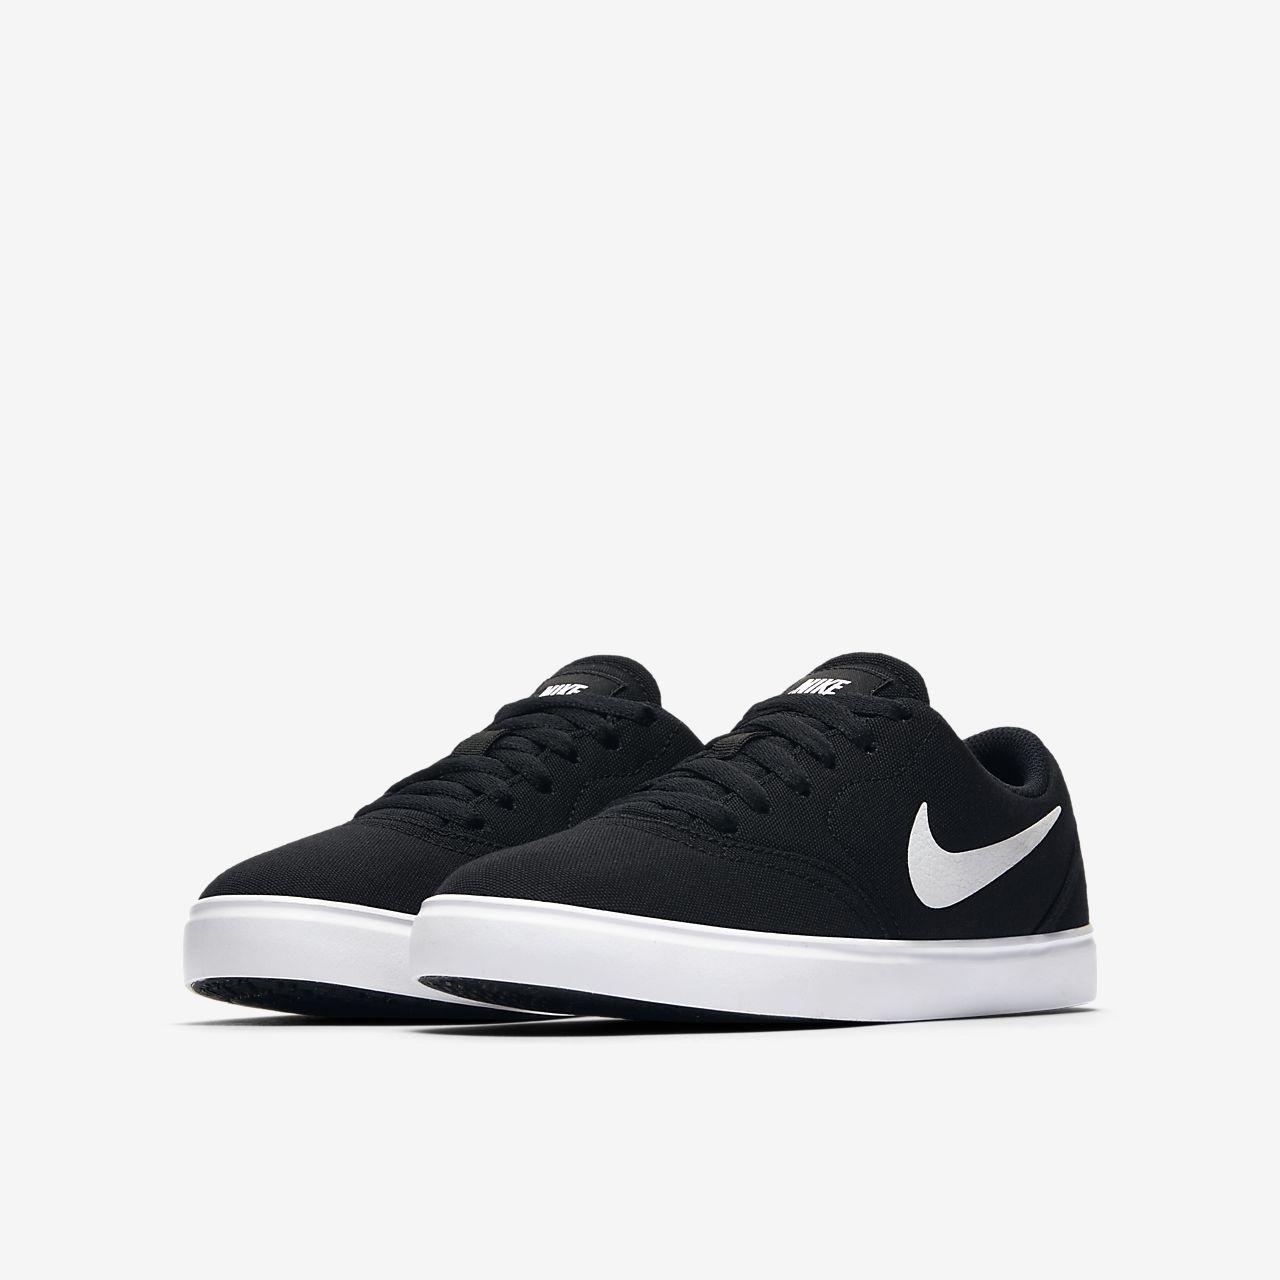 98a603d9f49de Nike Kyrie 3 Black Suede Black White Silt Red 852395-010 8-12.5 US ...